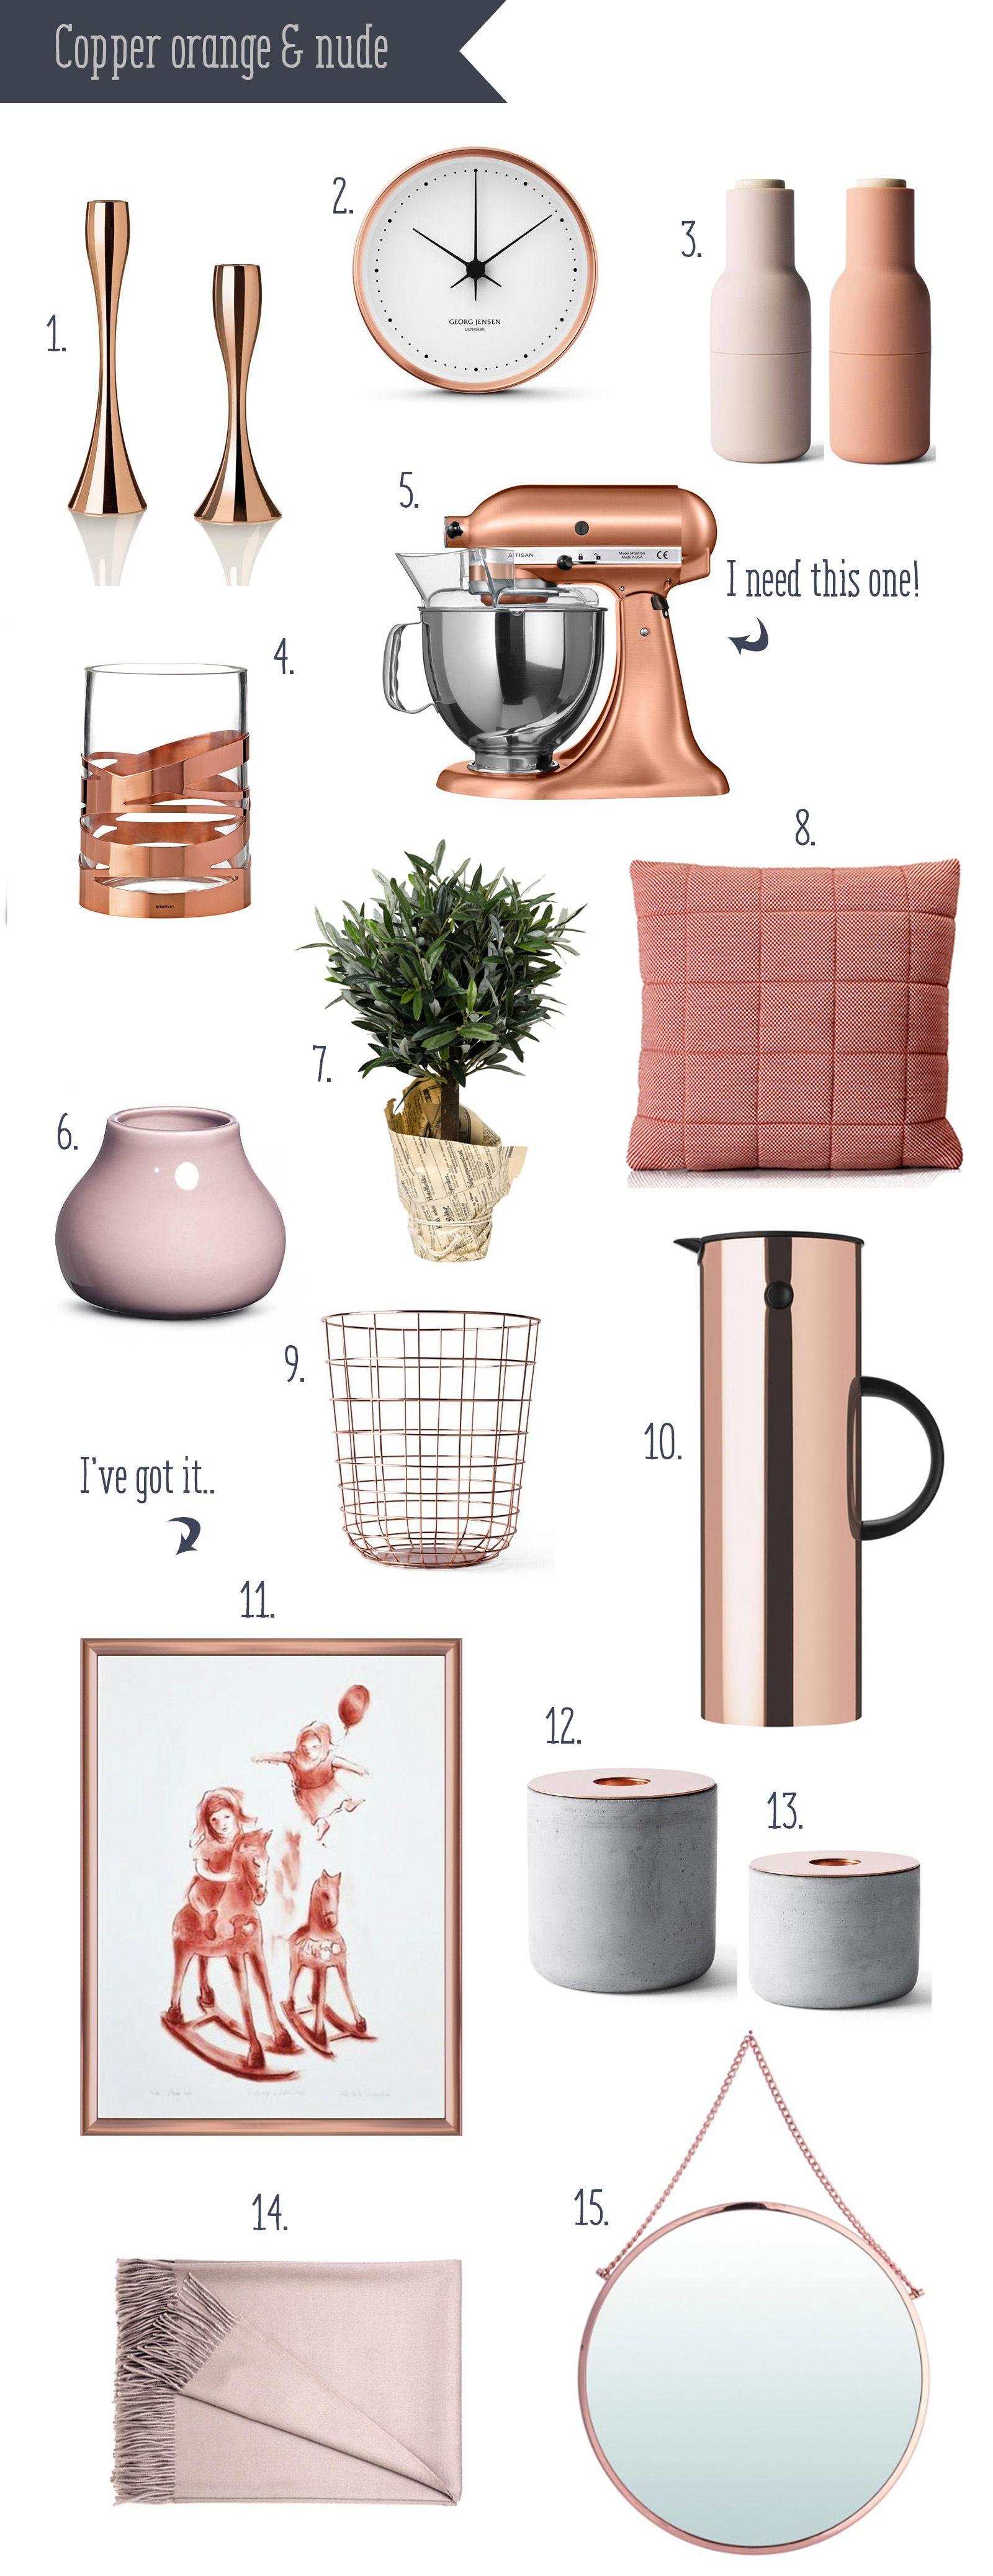 Spring trend 2015: copper orange and nude: interior wanties